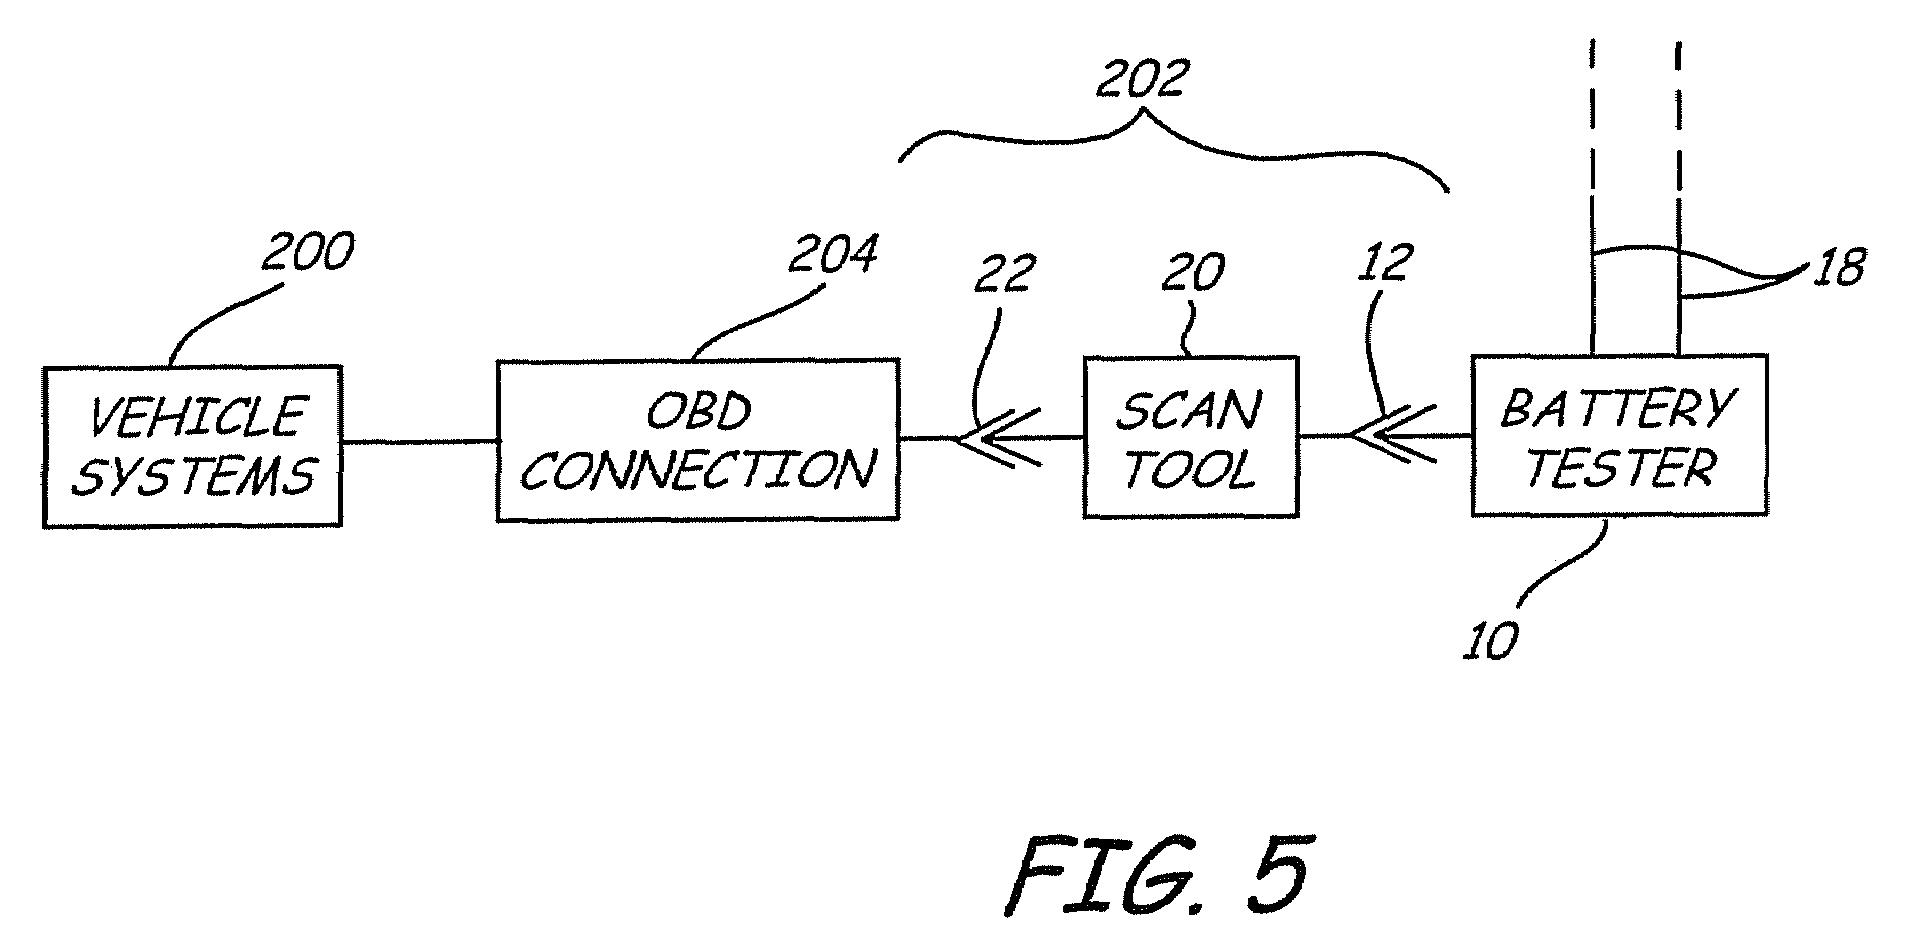 Patent US 7,728,597 B2